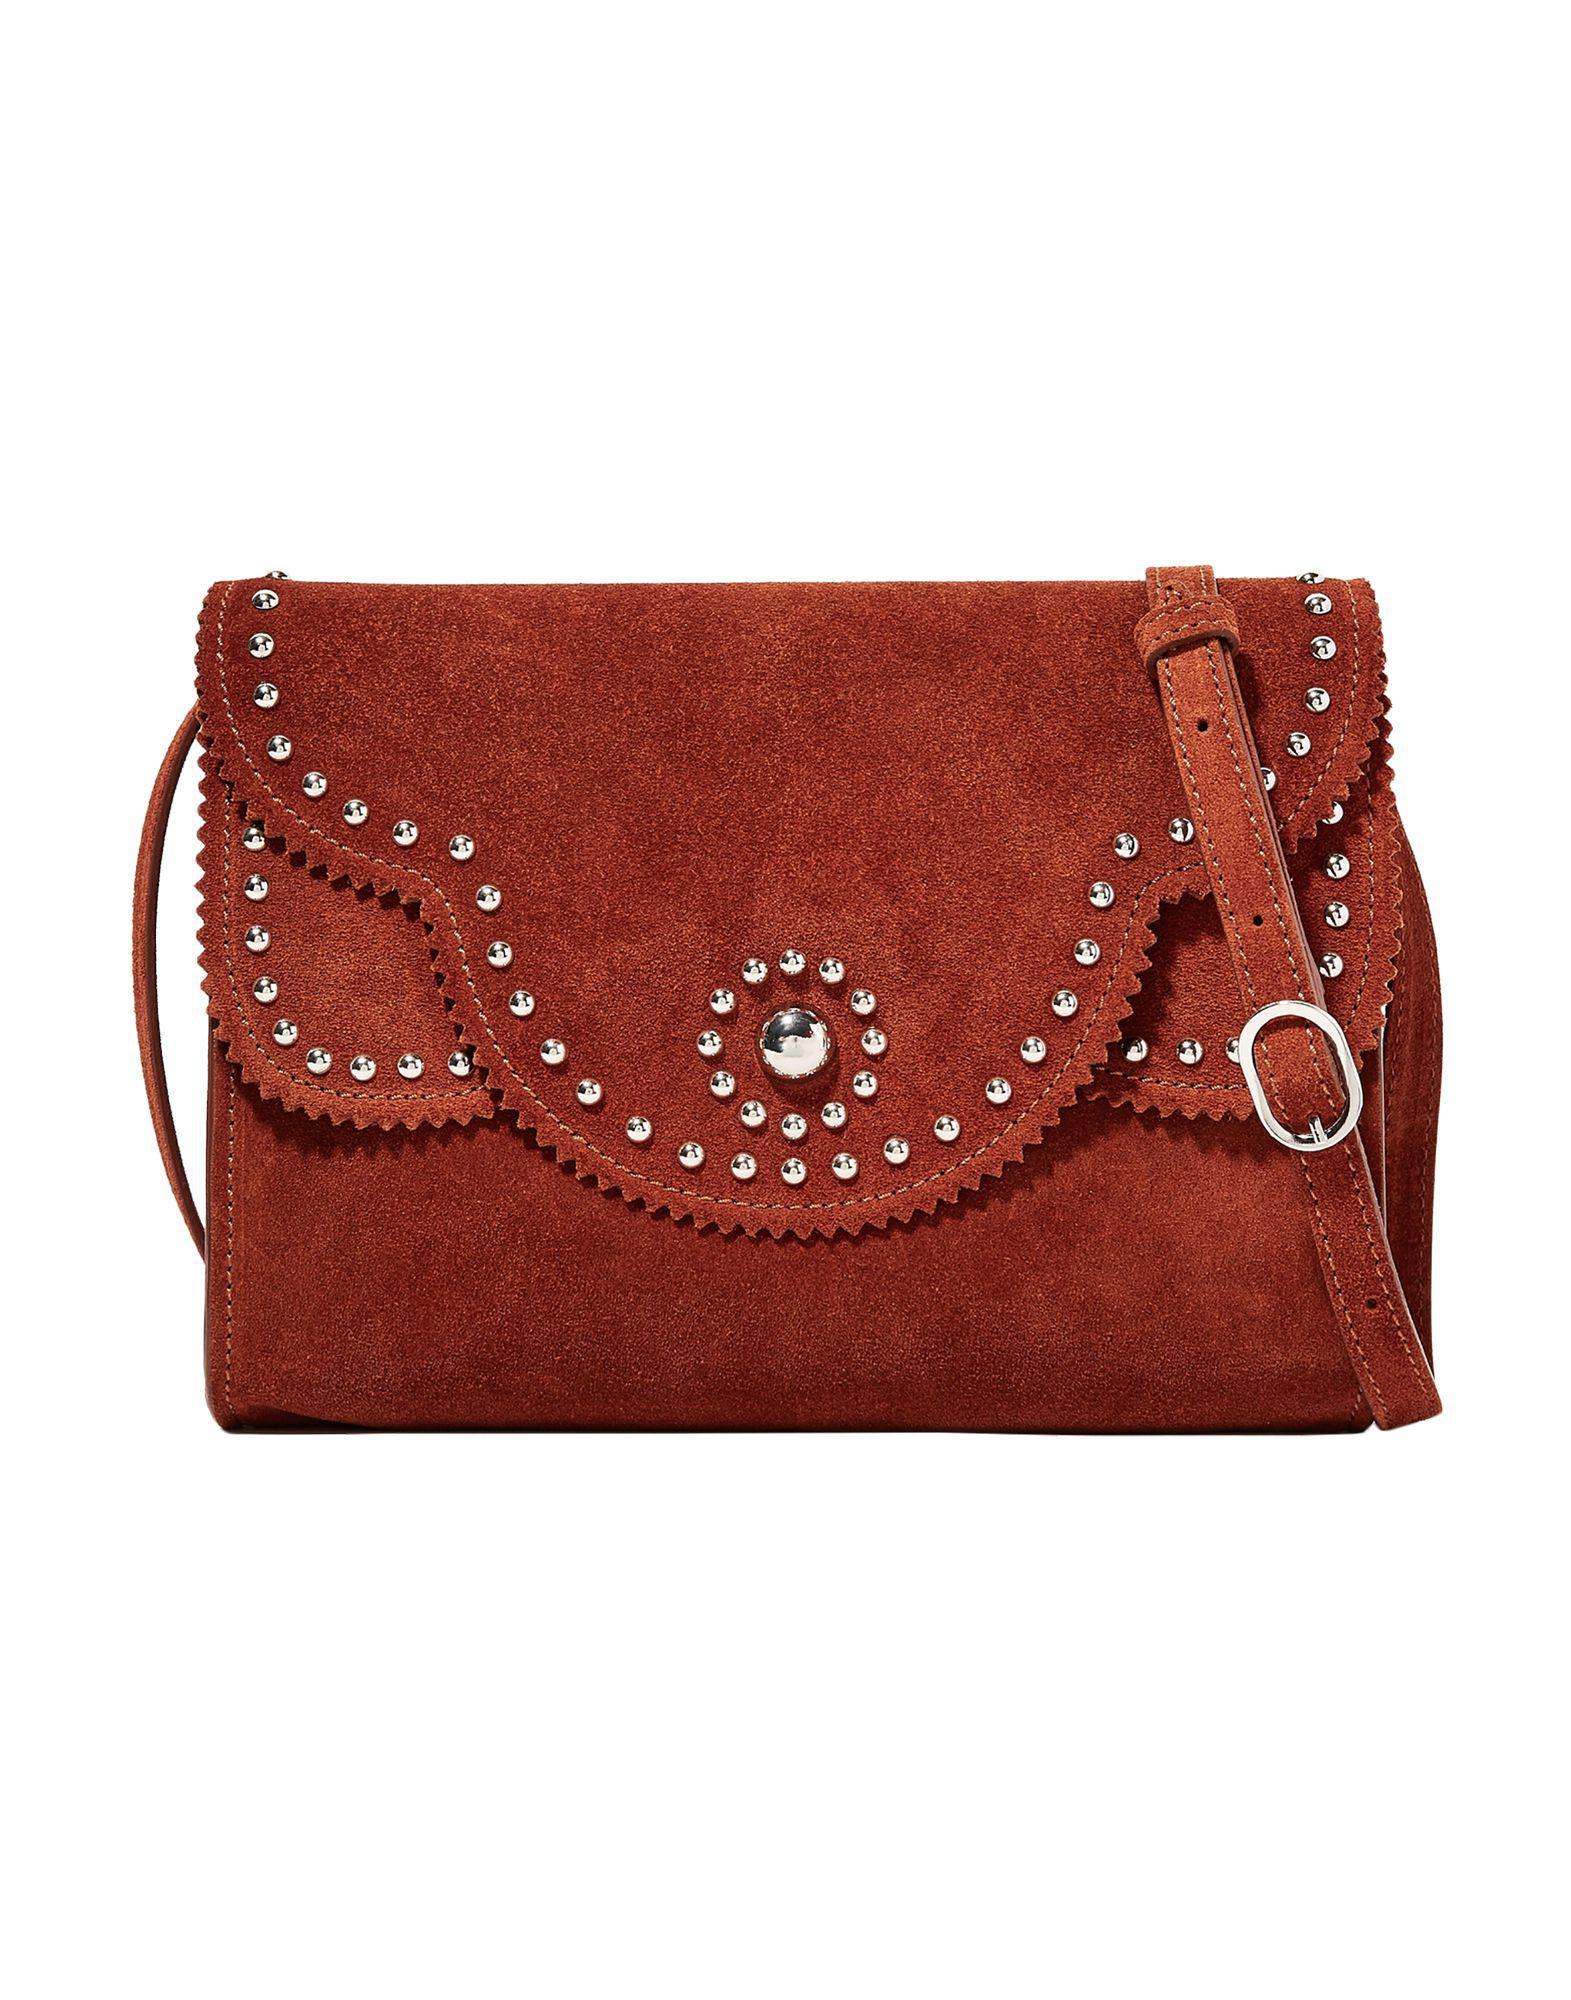 3c2dfabce154 Sandro Cross-body Bag in Brown - Lyst